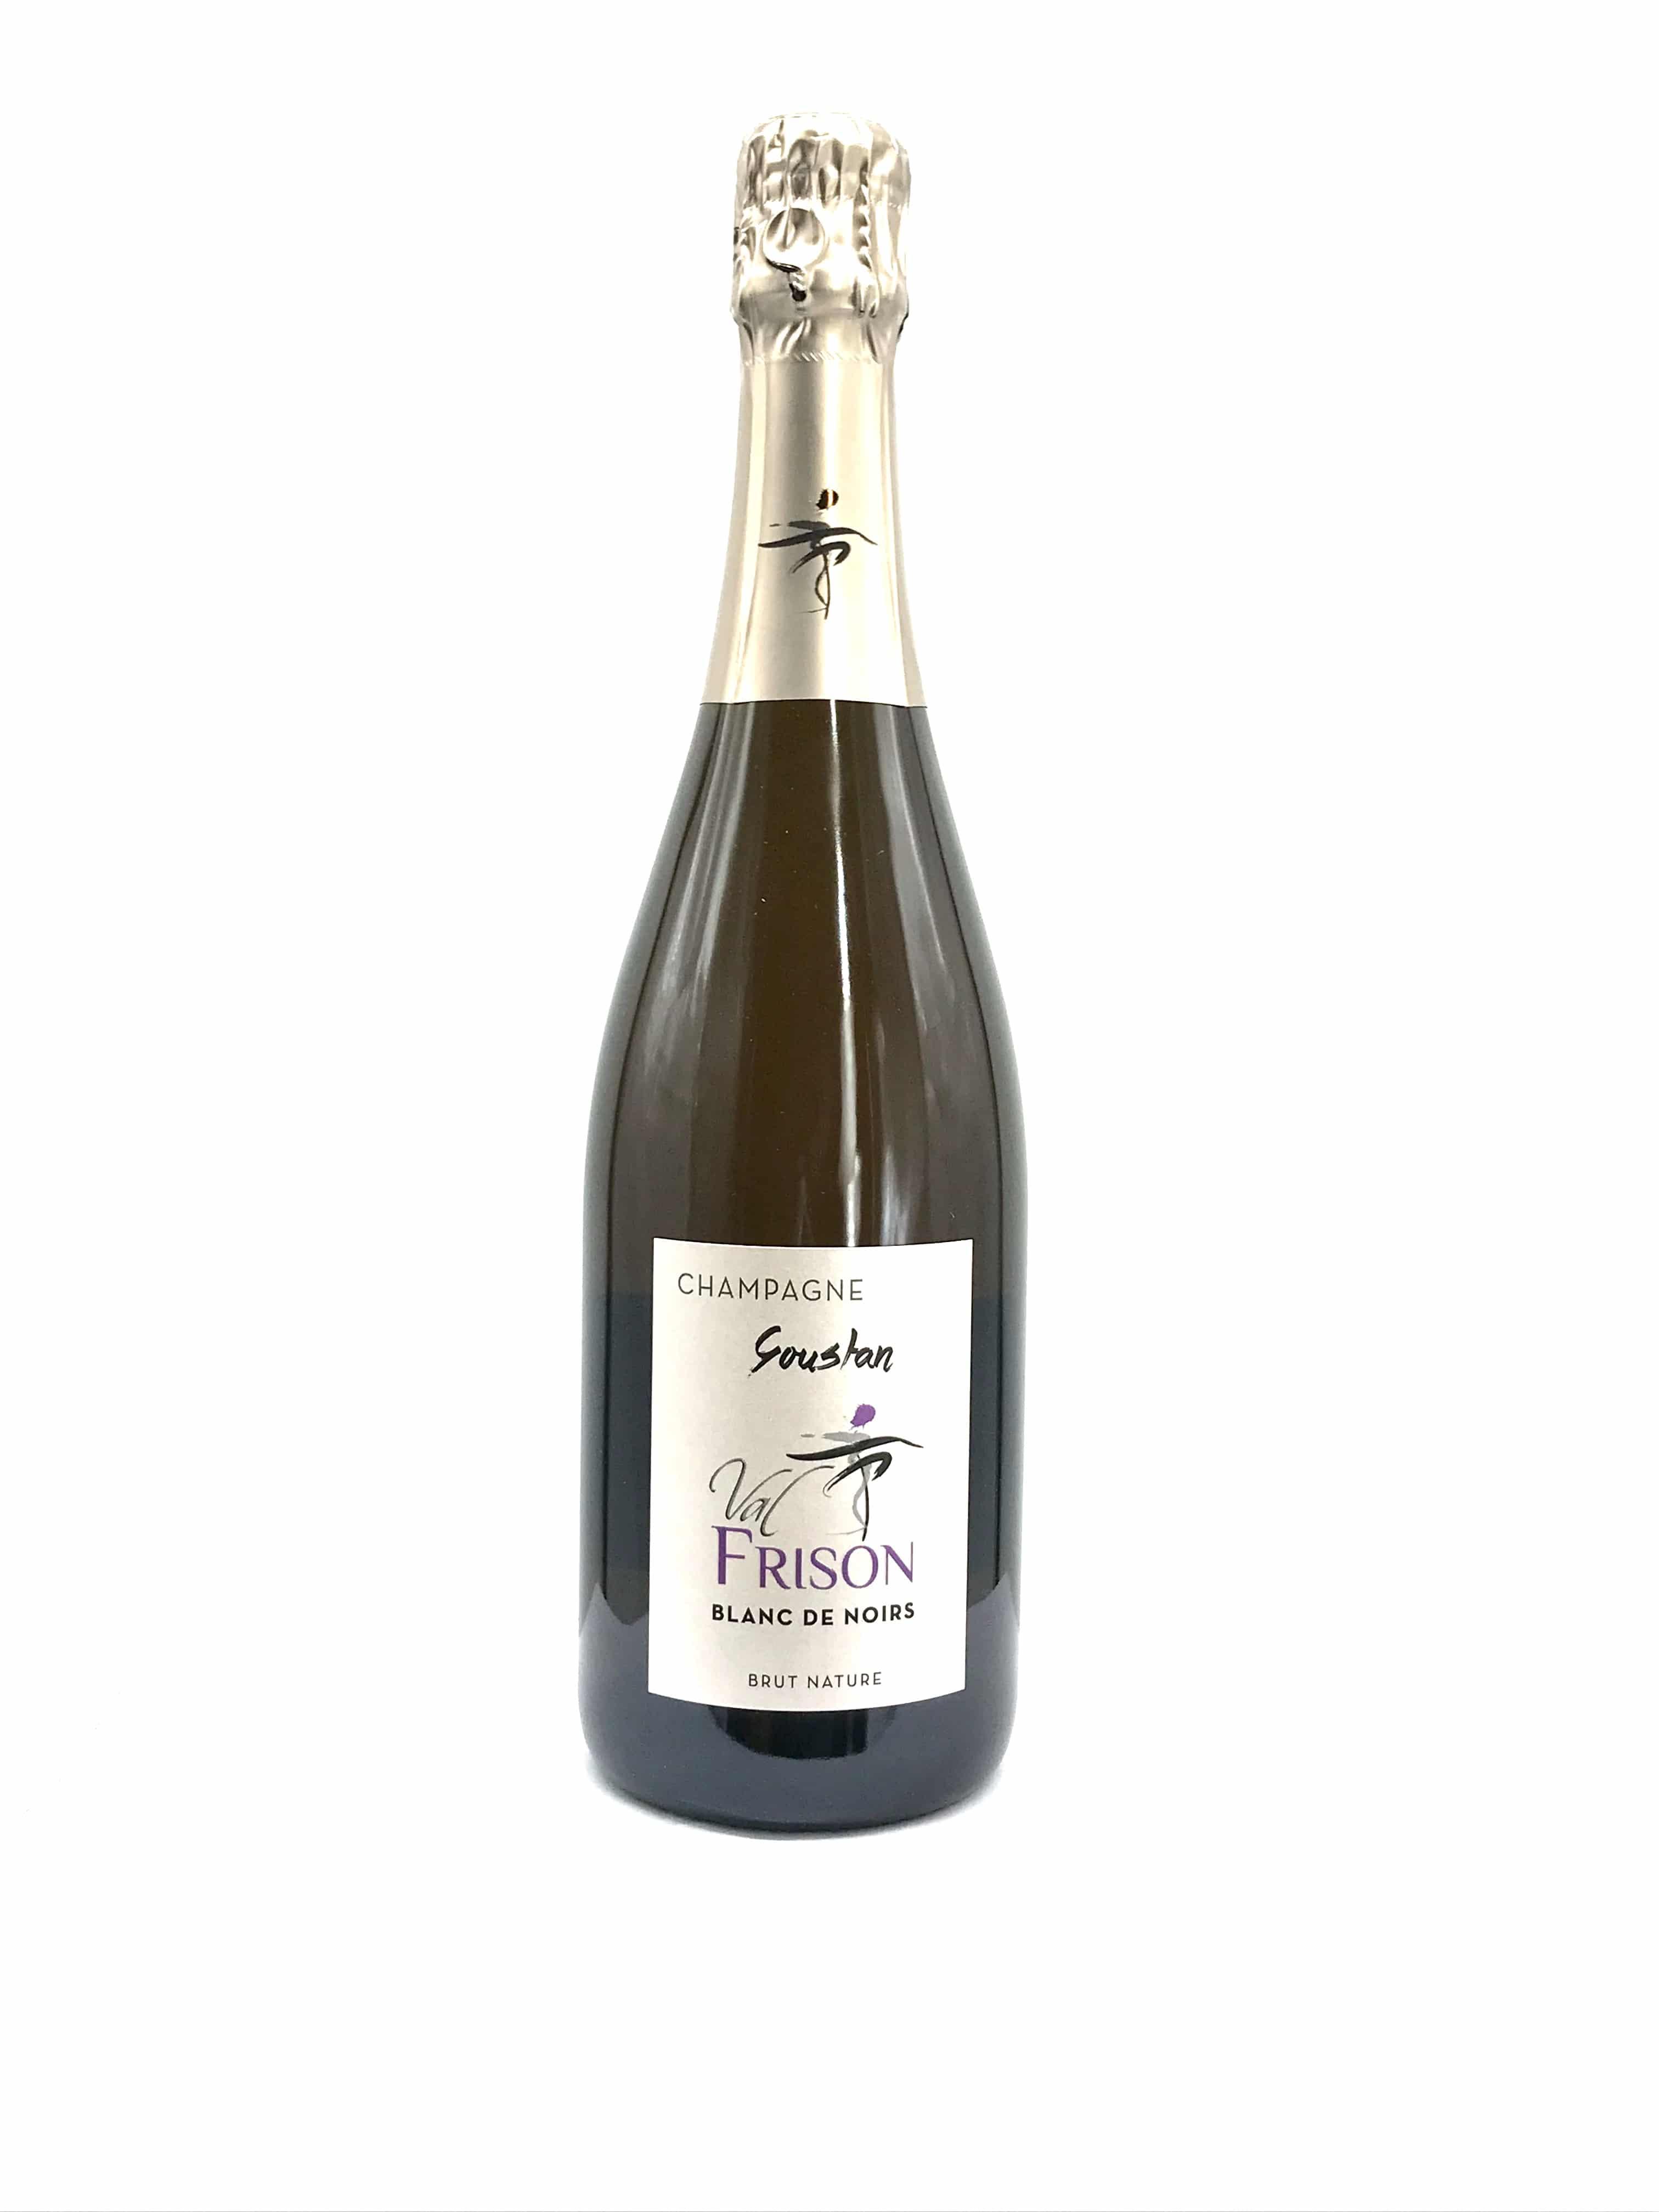 Champagne Valerie Frison Goustan